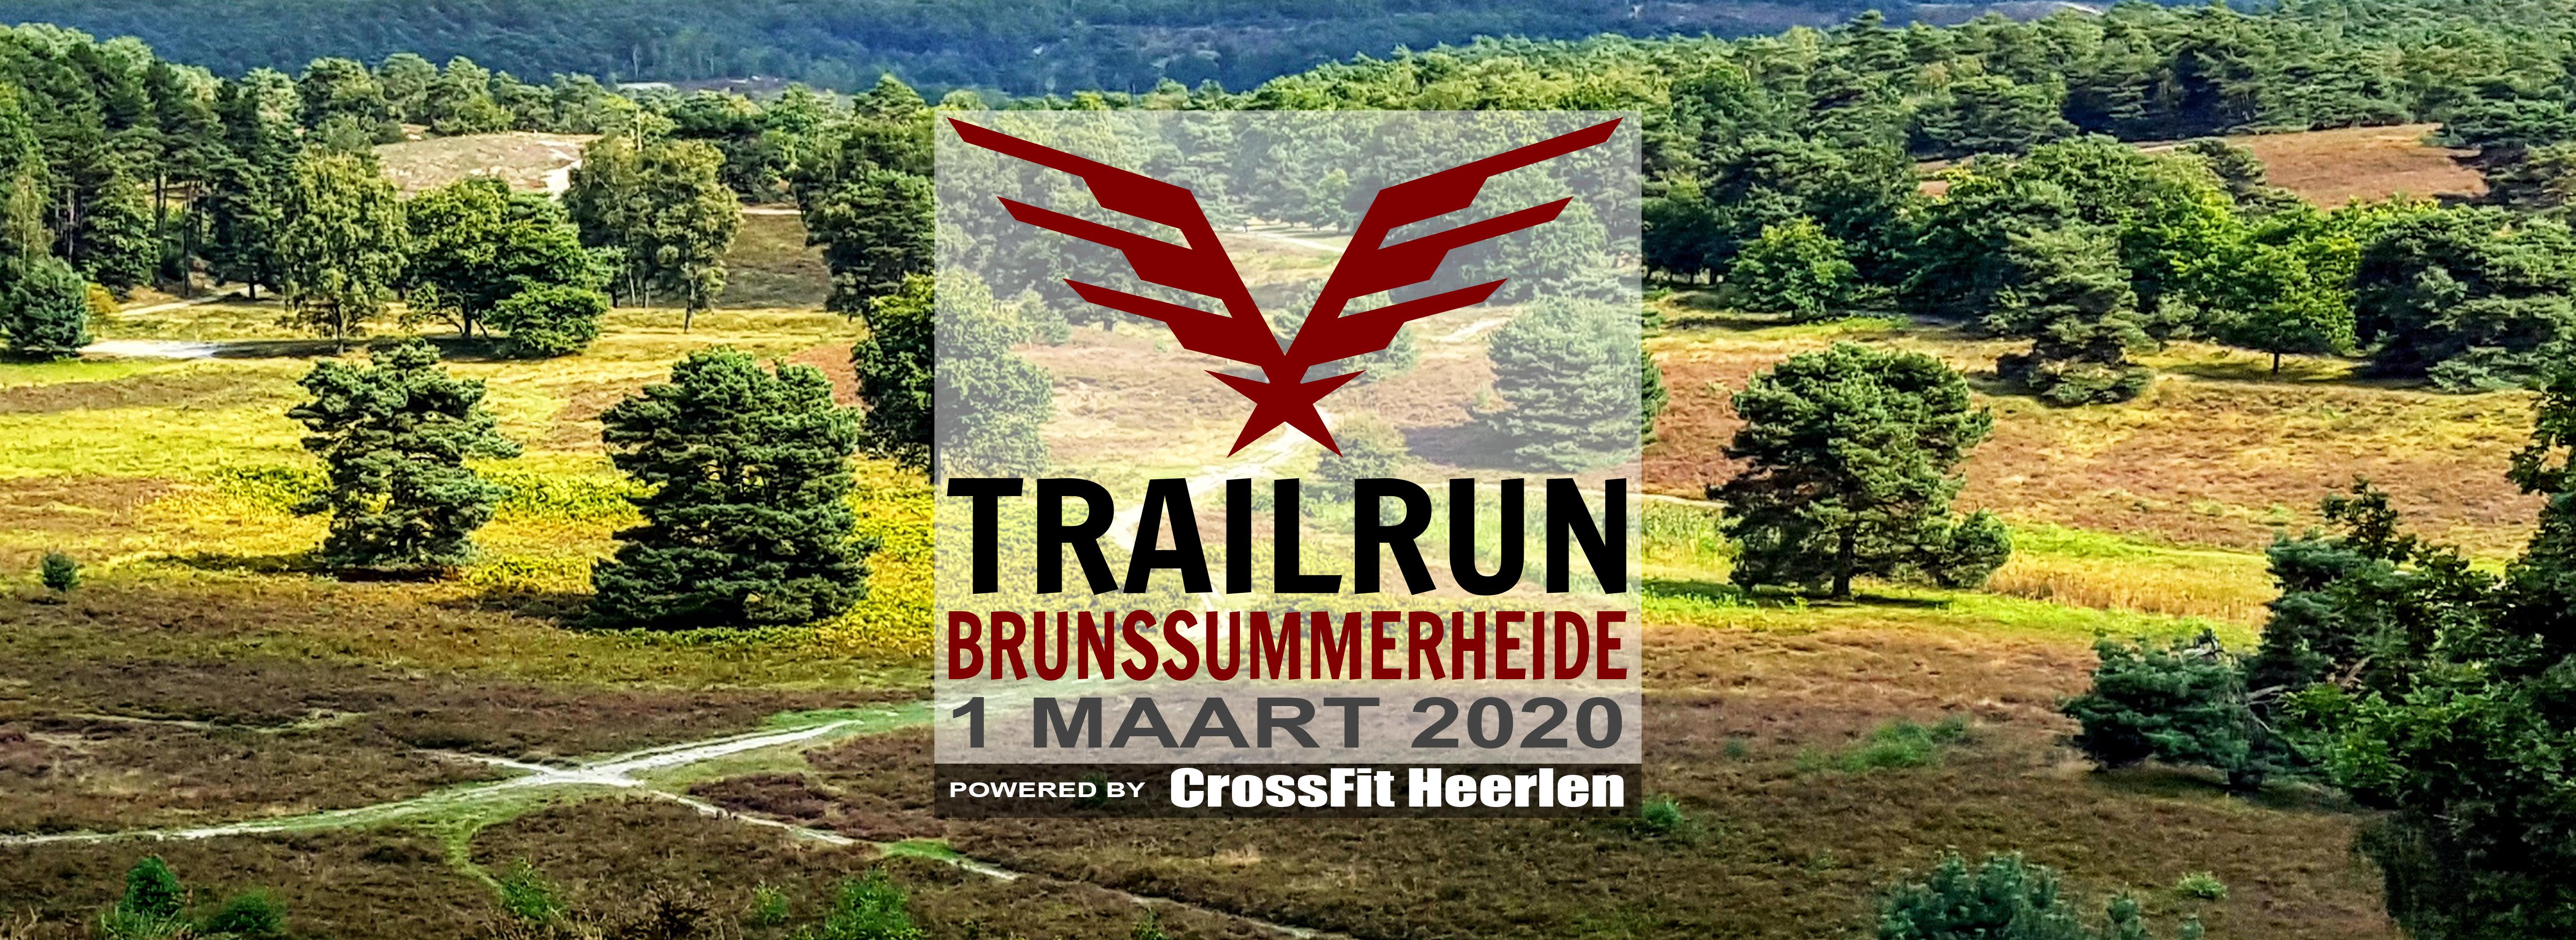 Trailrun Brunssummerheide 2020